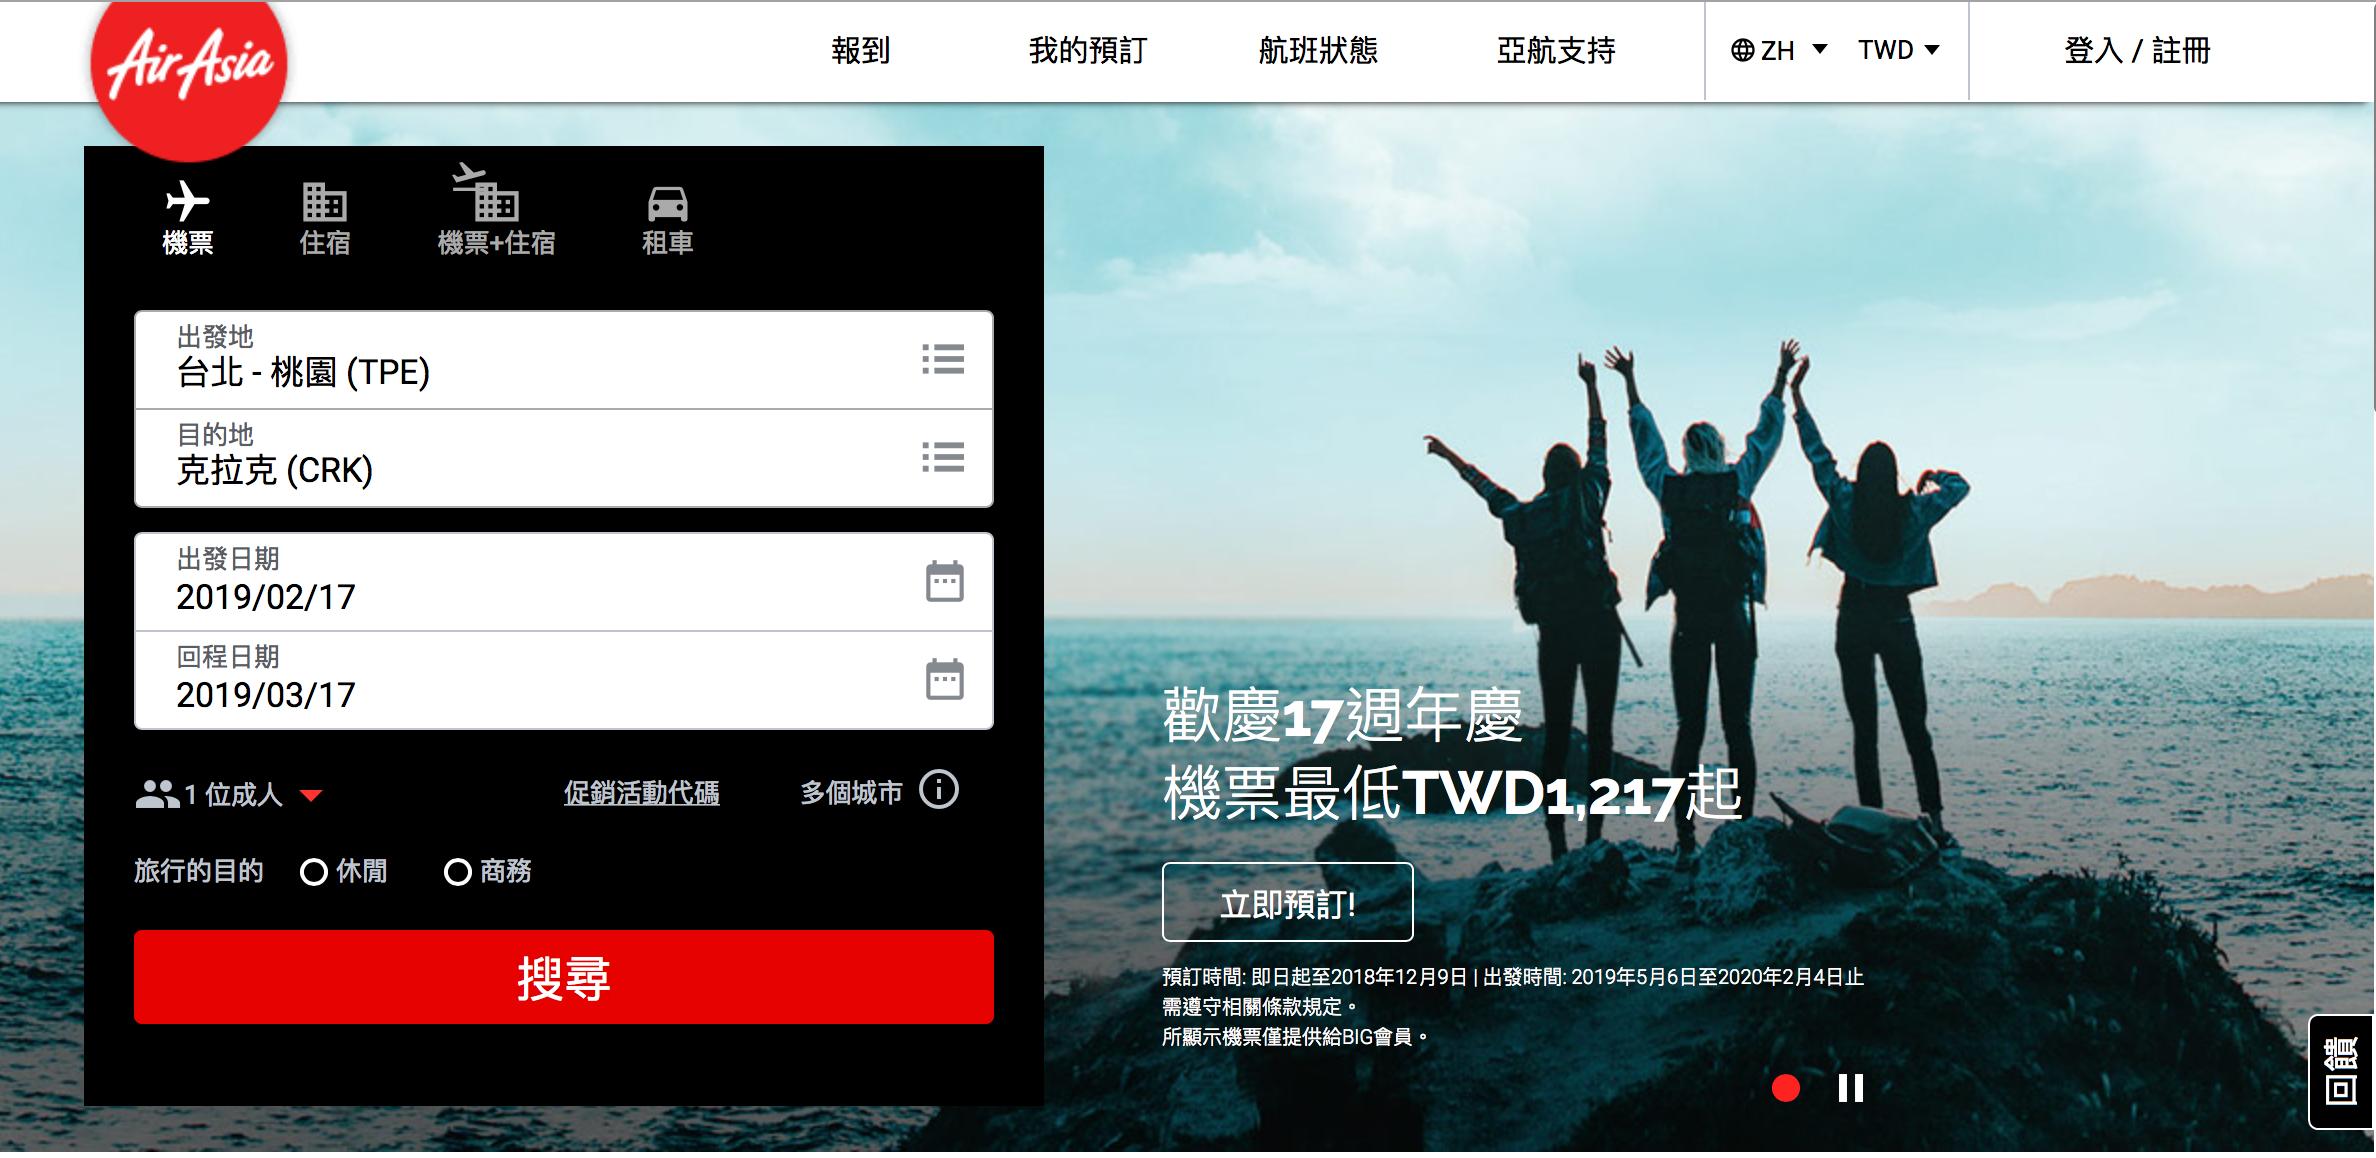 AirAsia亞洲航空網站首頁